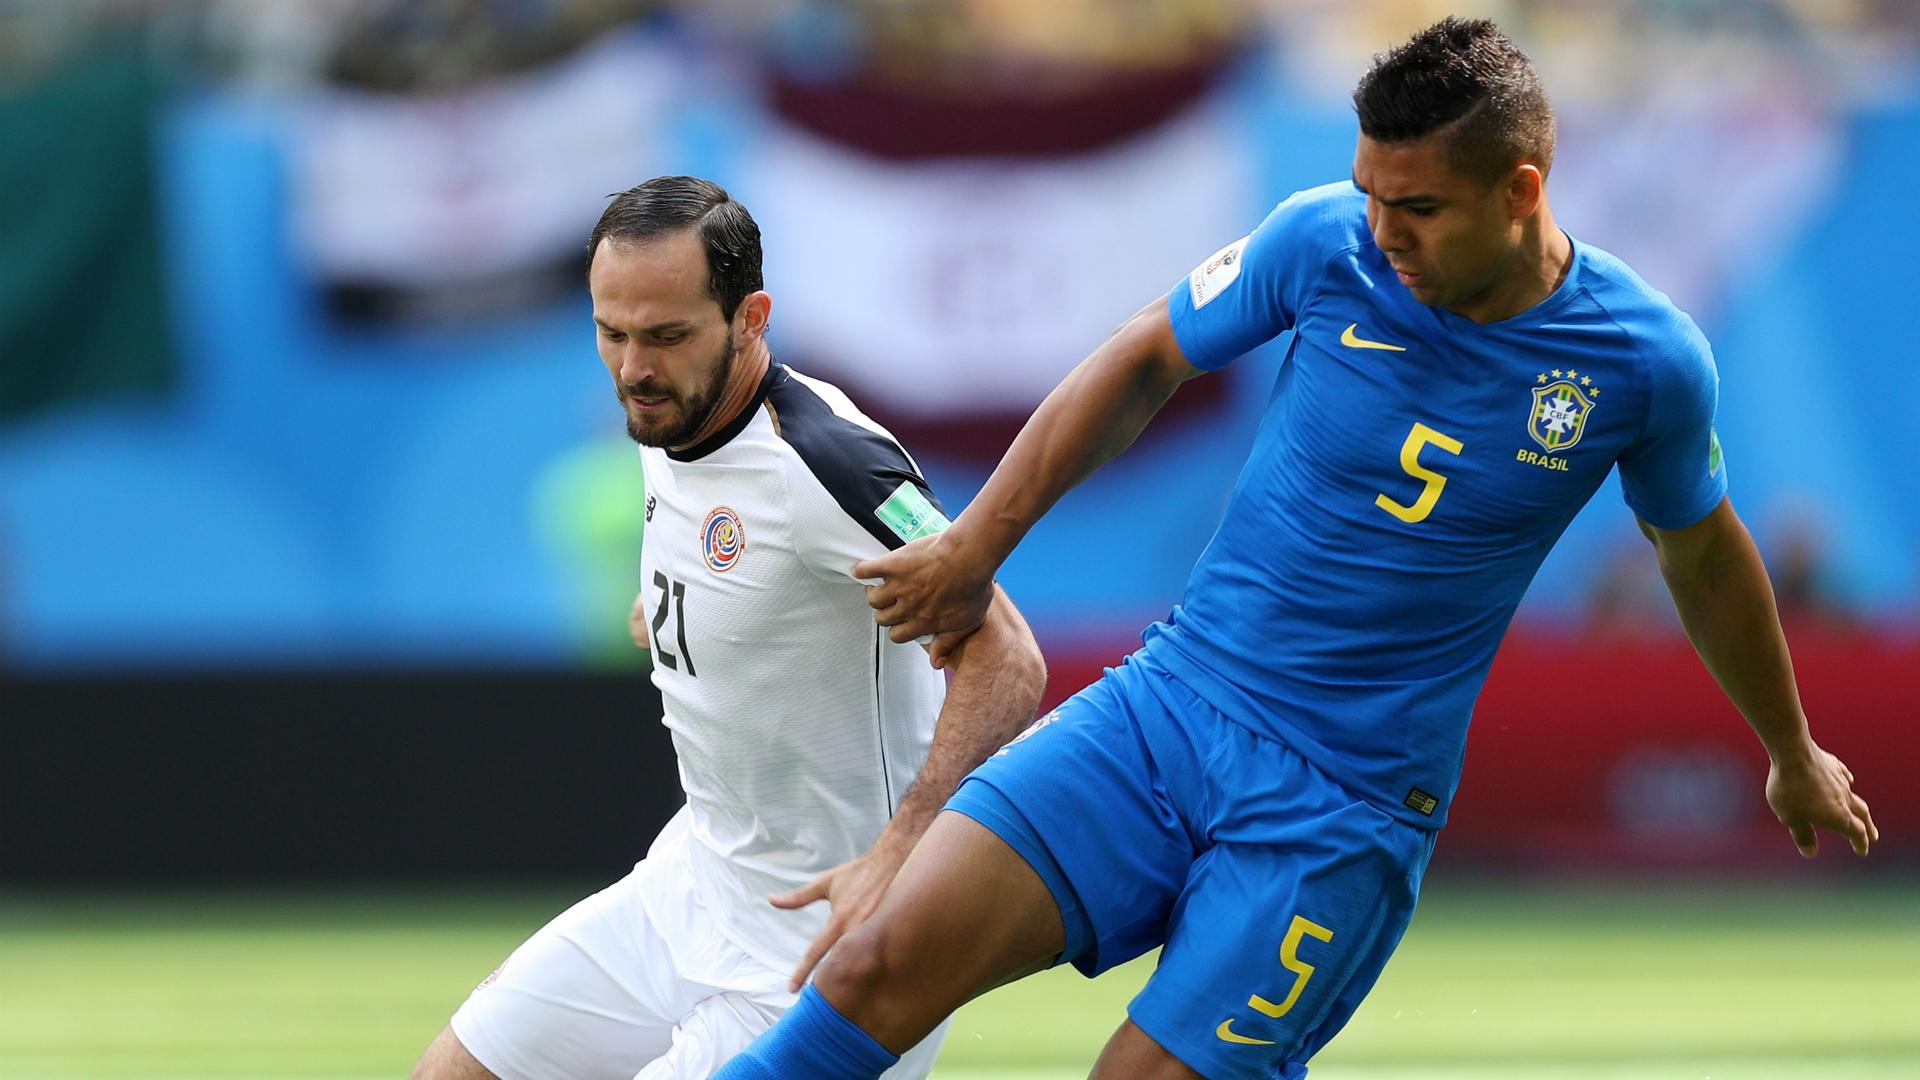 Casemiro I Brasil Costa Rica I 22 06 18 I Copa do Mundo